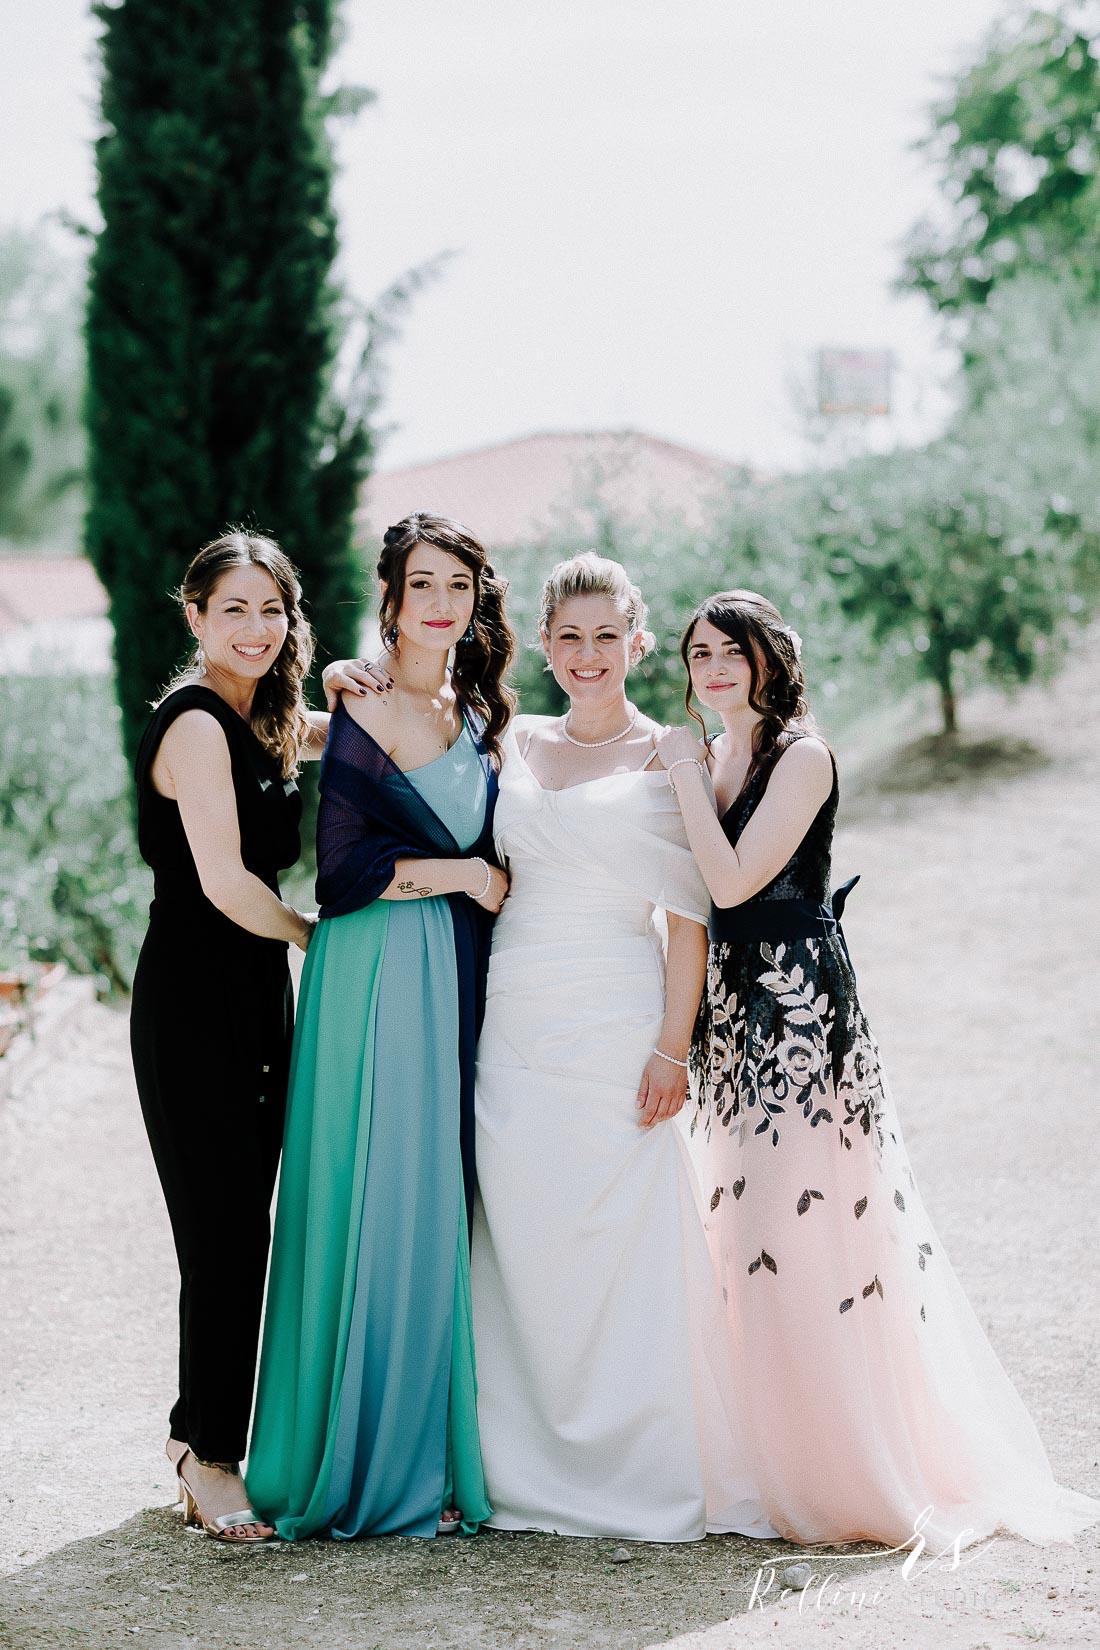 fotografo matrimonio Campo Antico Terni 031.jpg